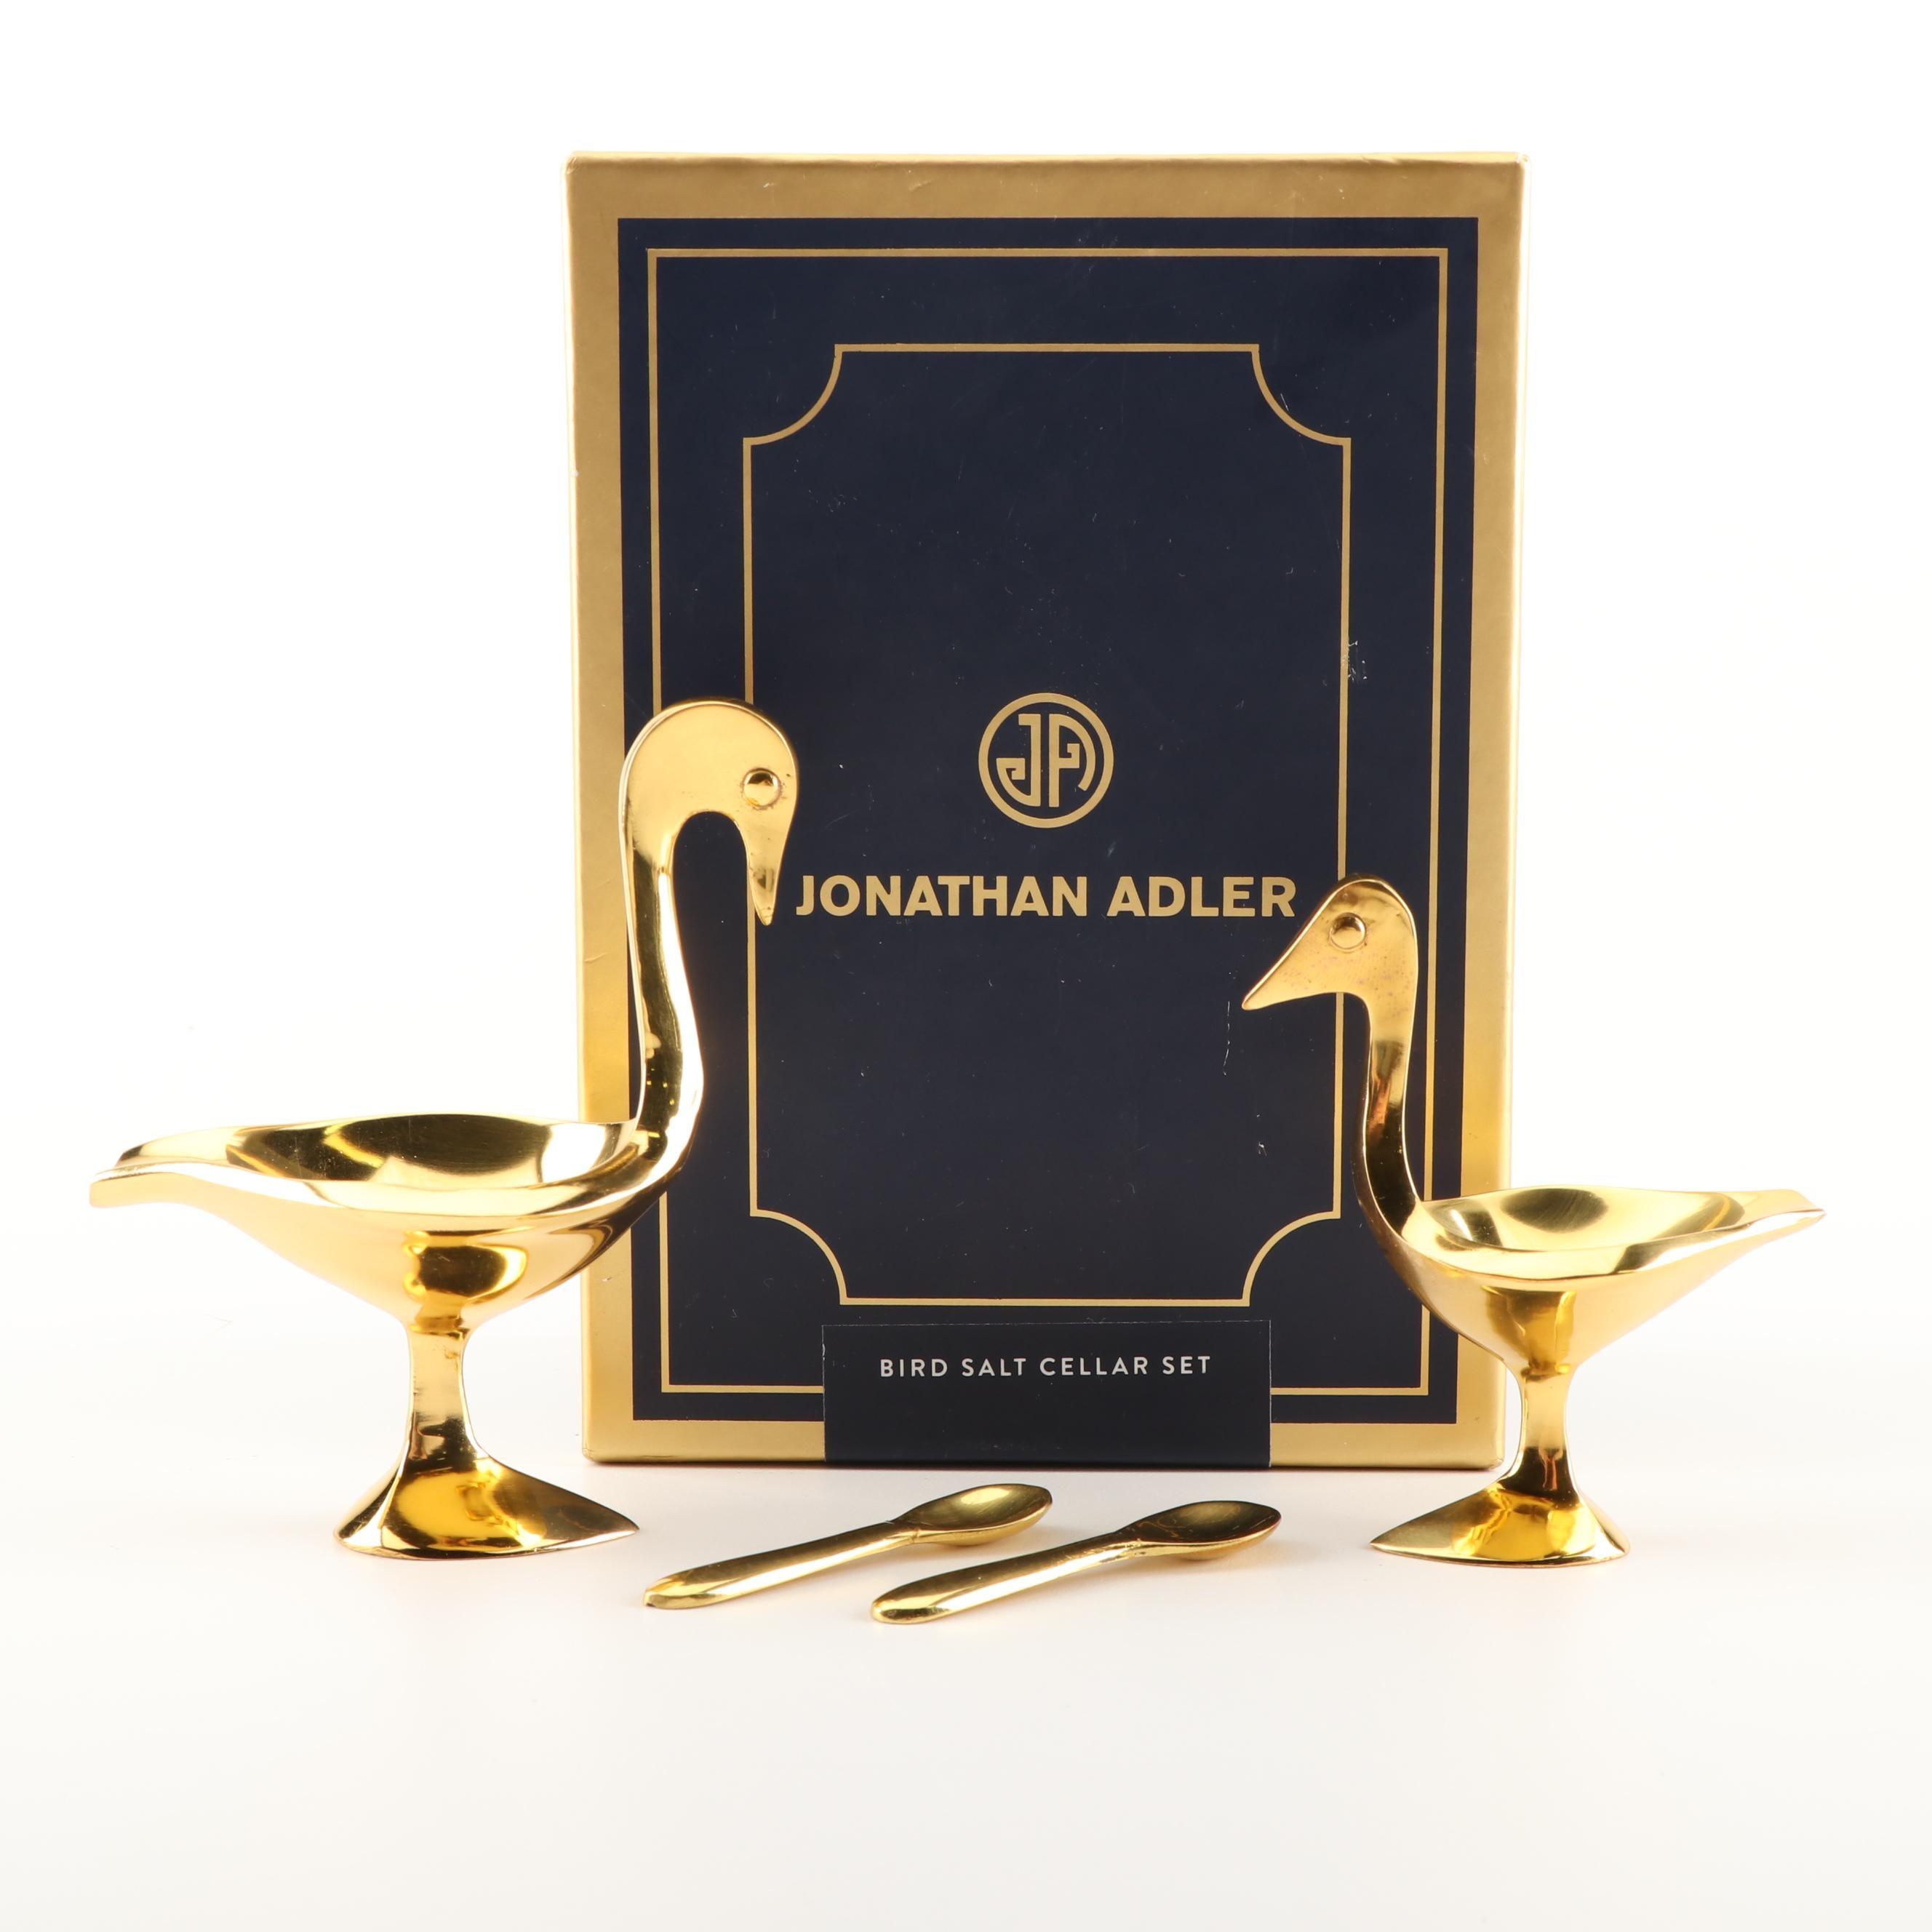 Jonathan Adler Bird Salt Cellar Set